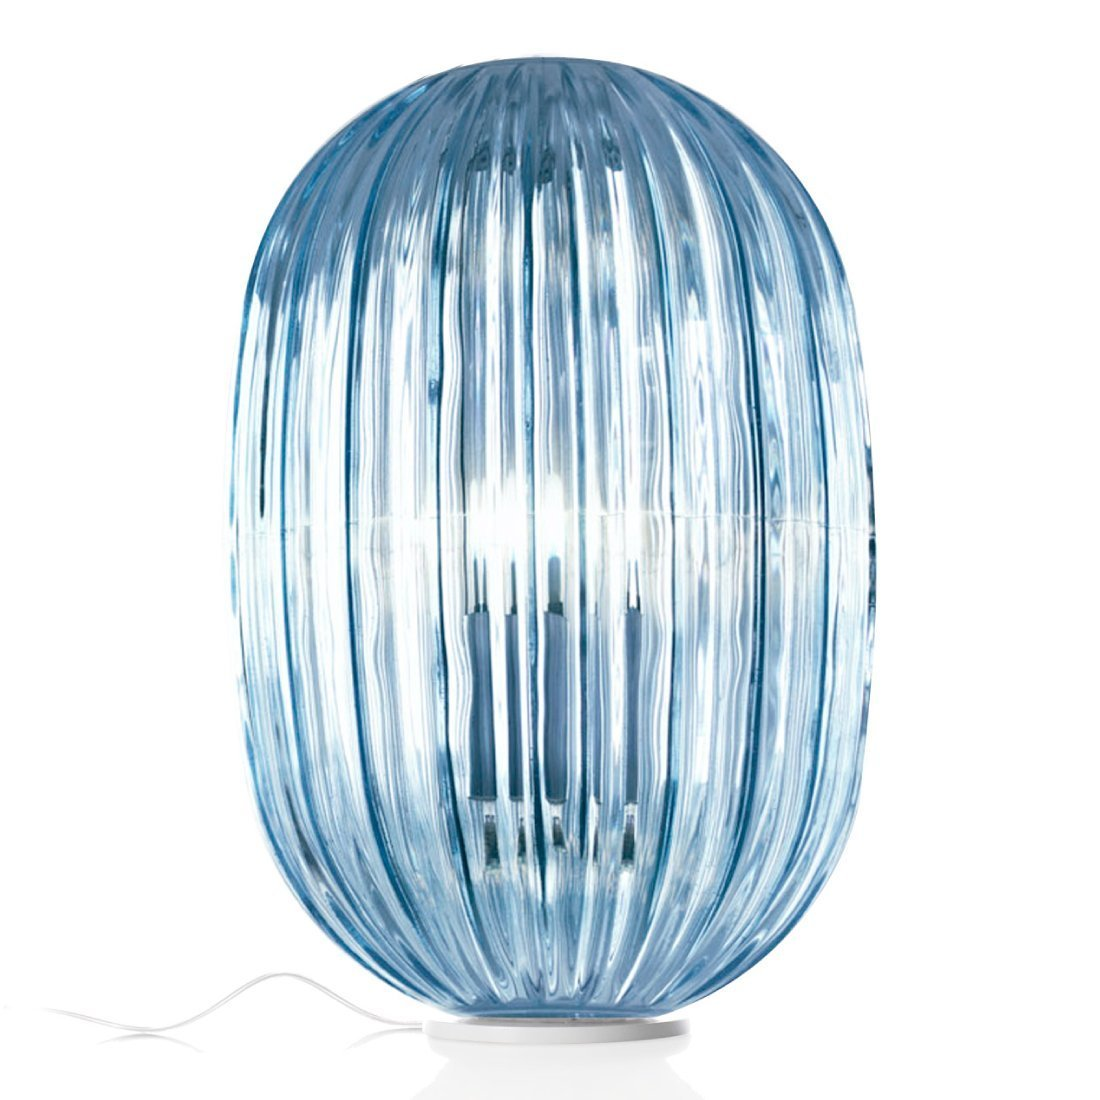 Foscarini Plass Media Tafellamp Blauw